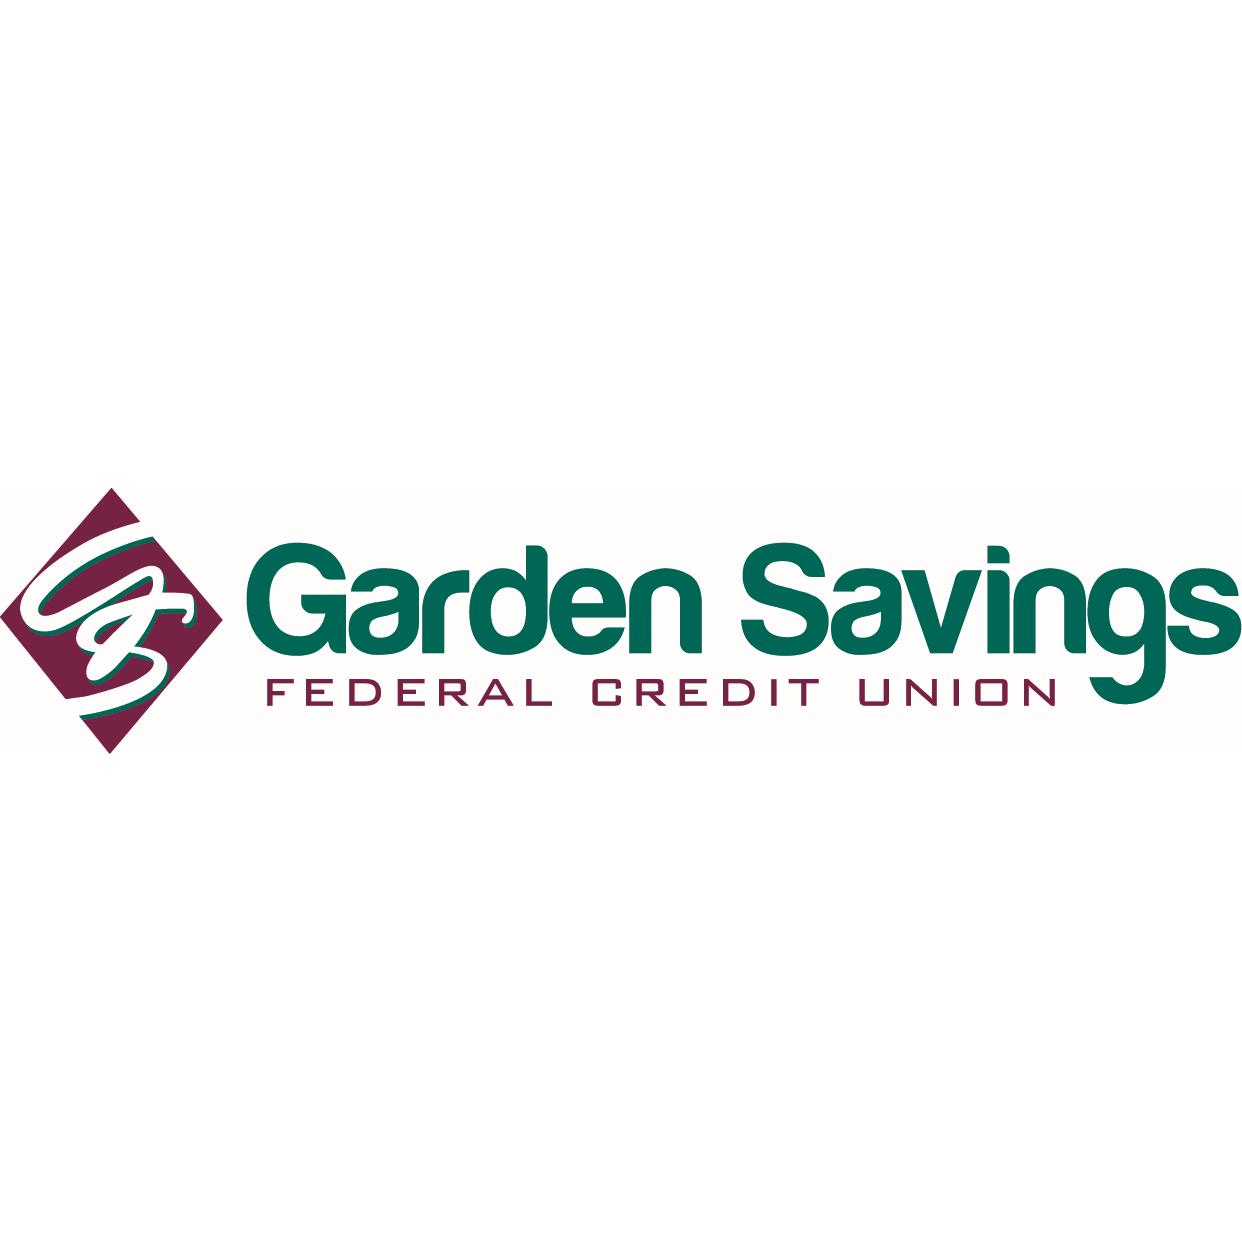 garden savings federal credit union parsippany new jersey nj